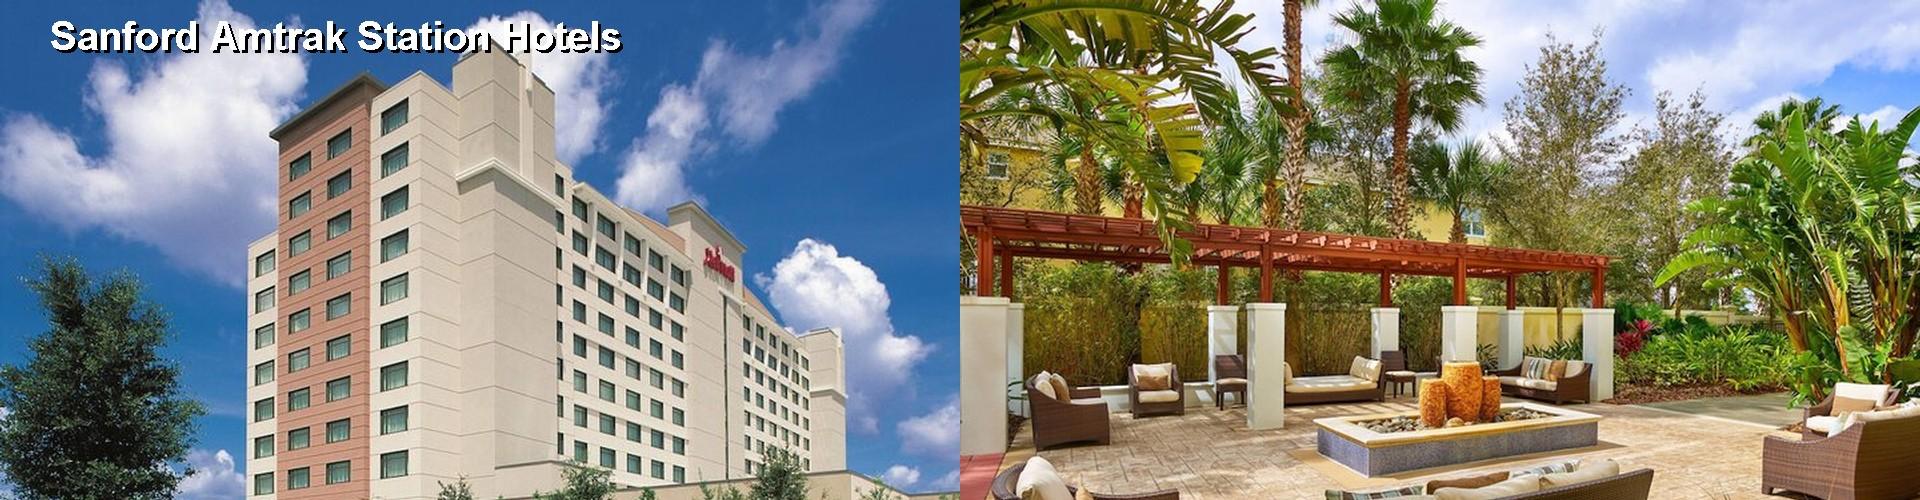 5 Best Hotels Near Sanford Amtrak Station